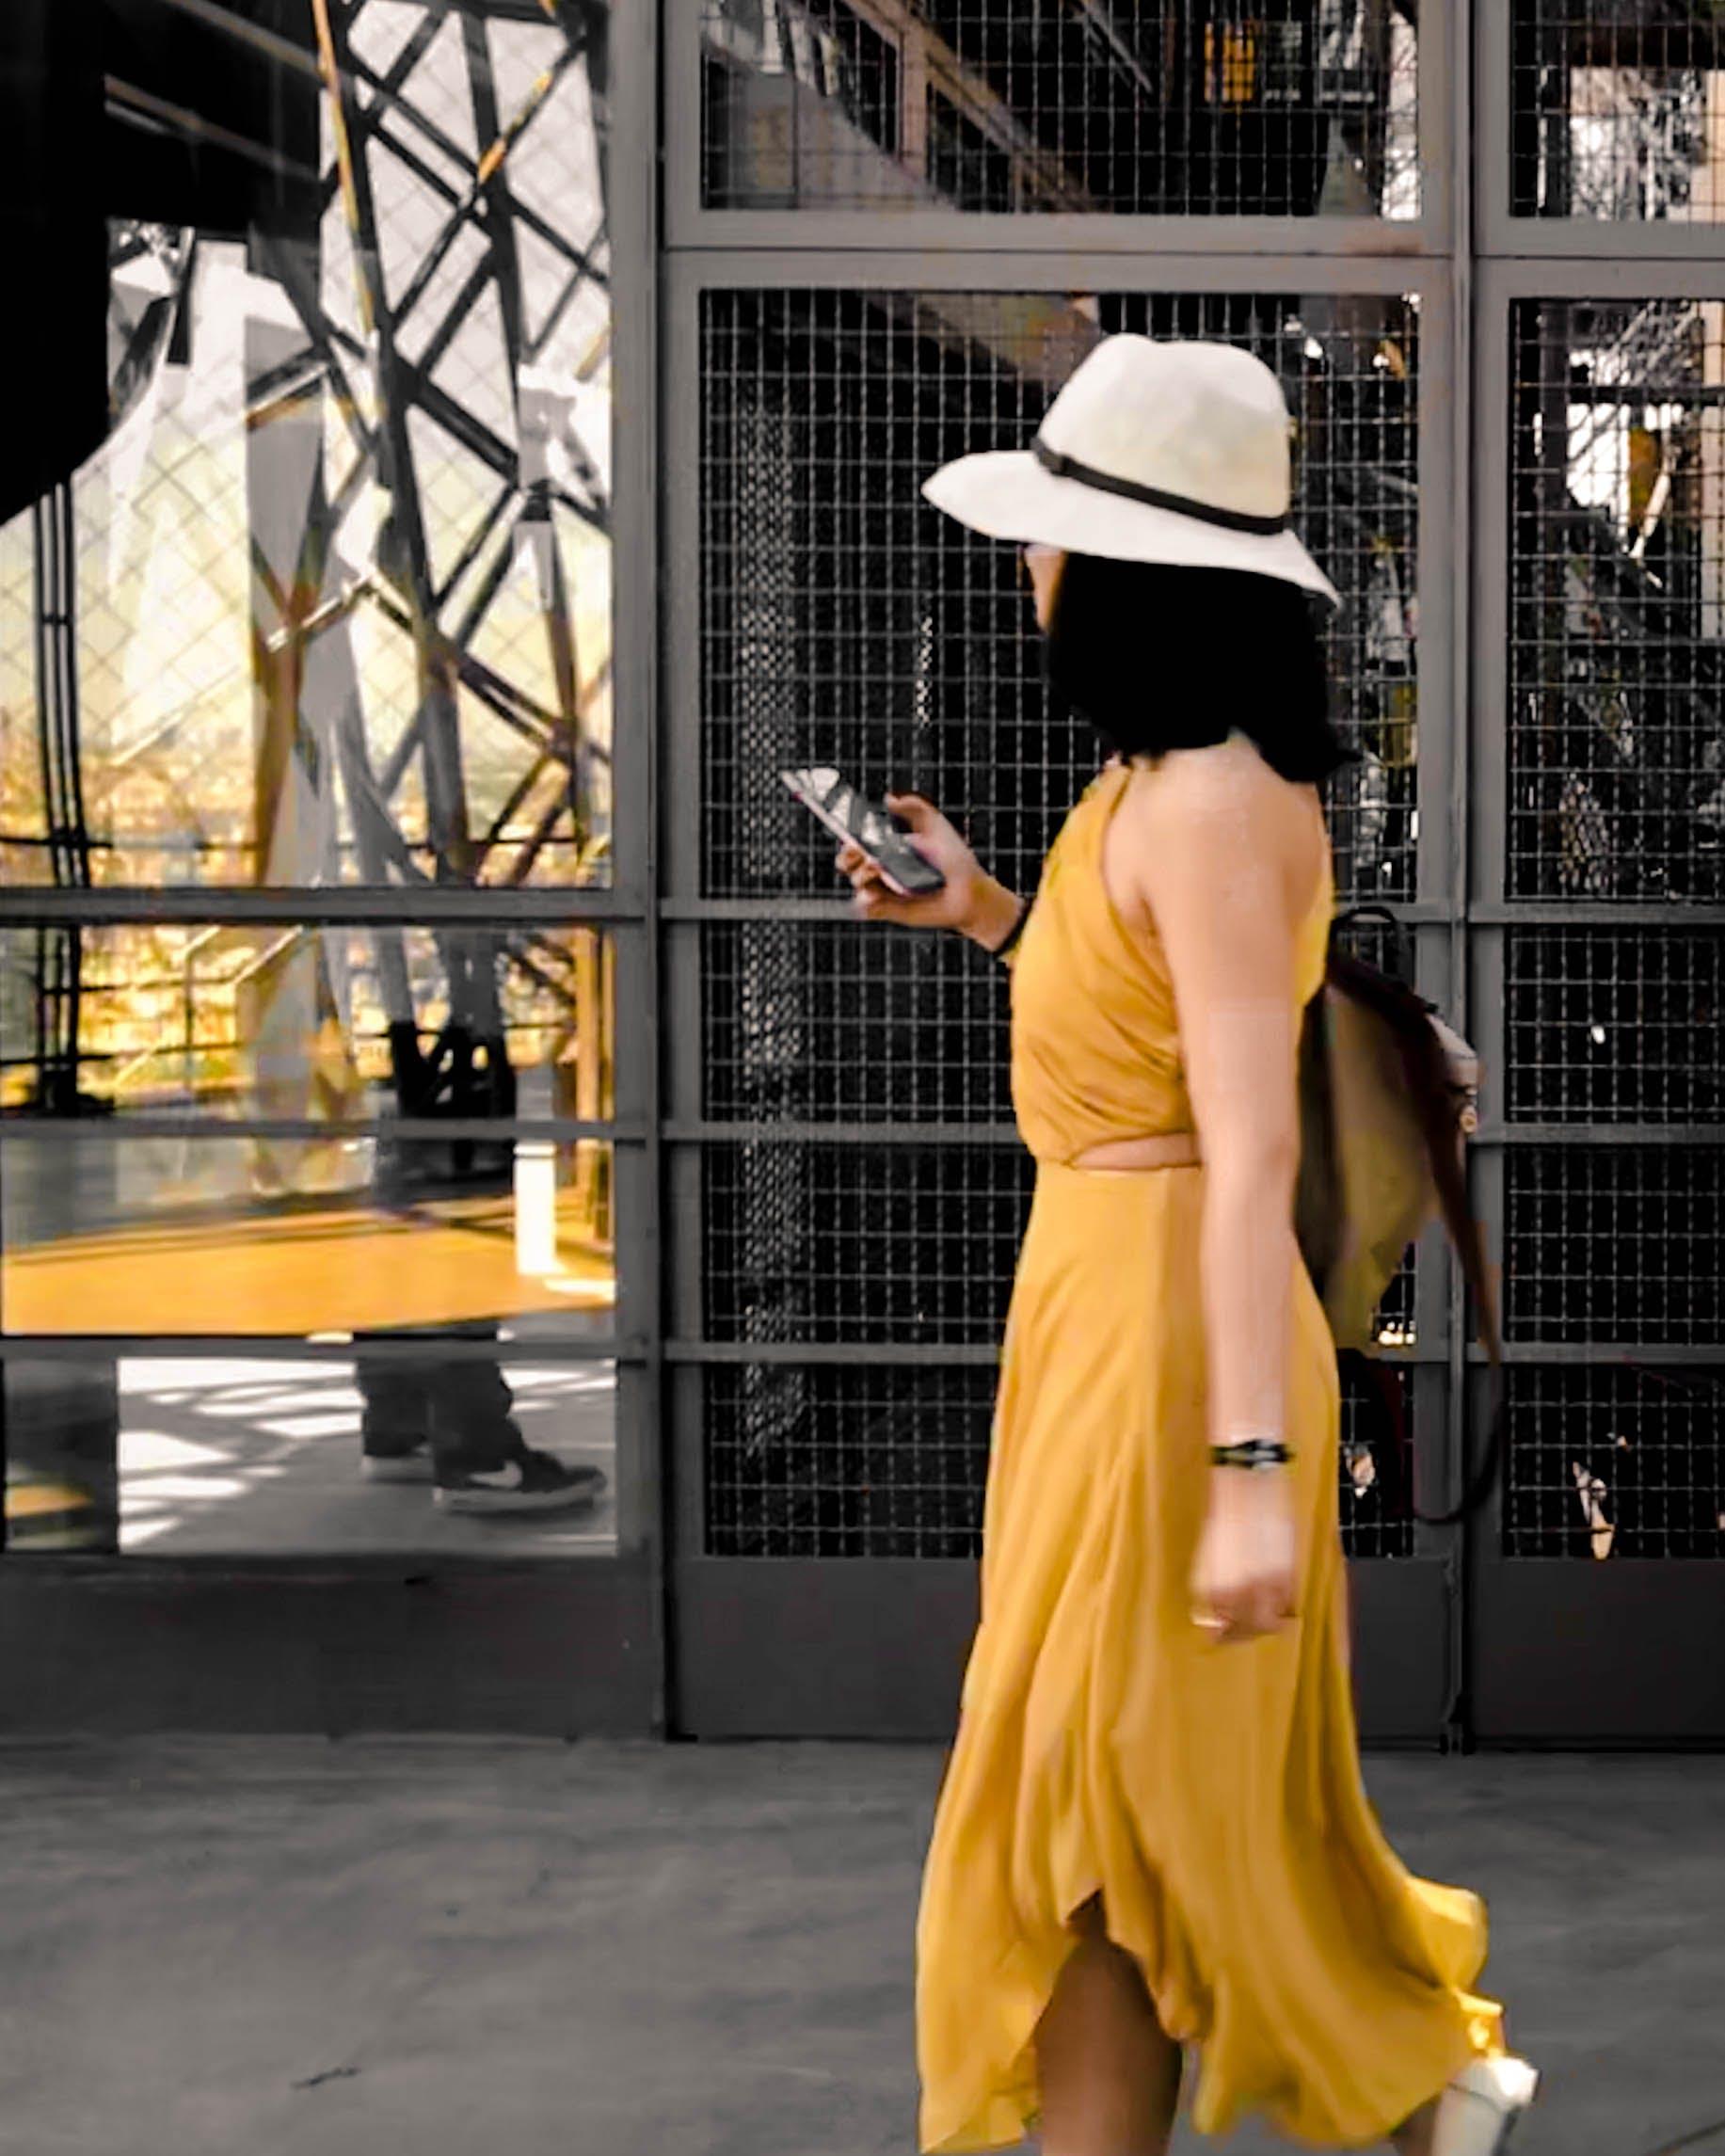 Free stock photo of eiffel tower, woman, yellow